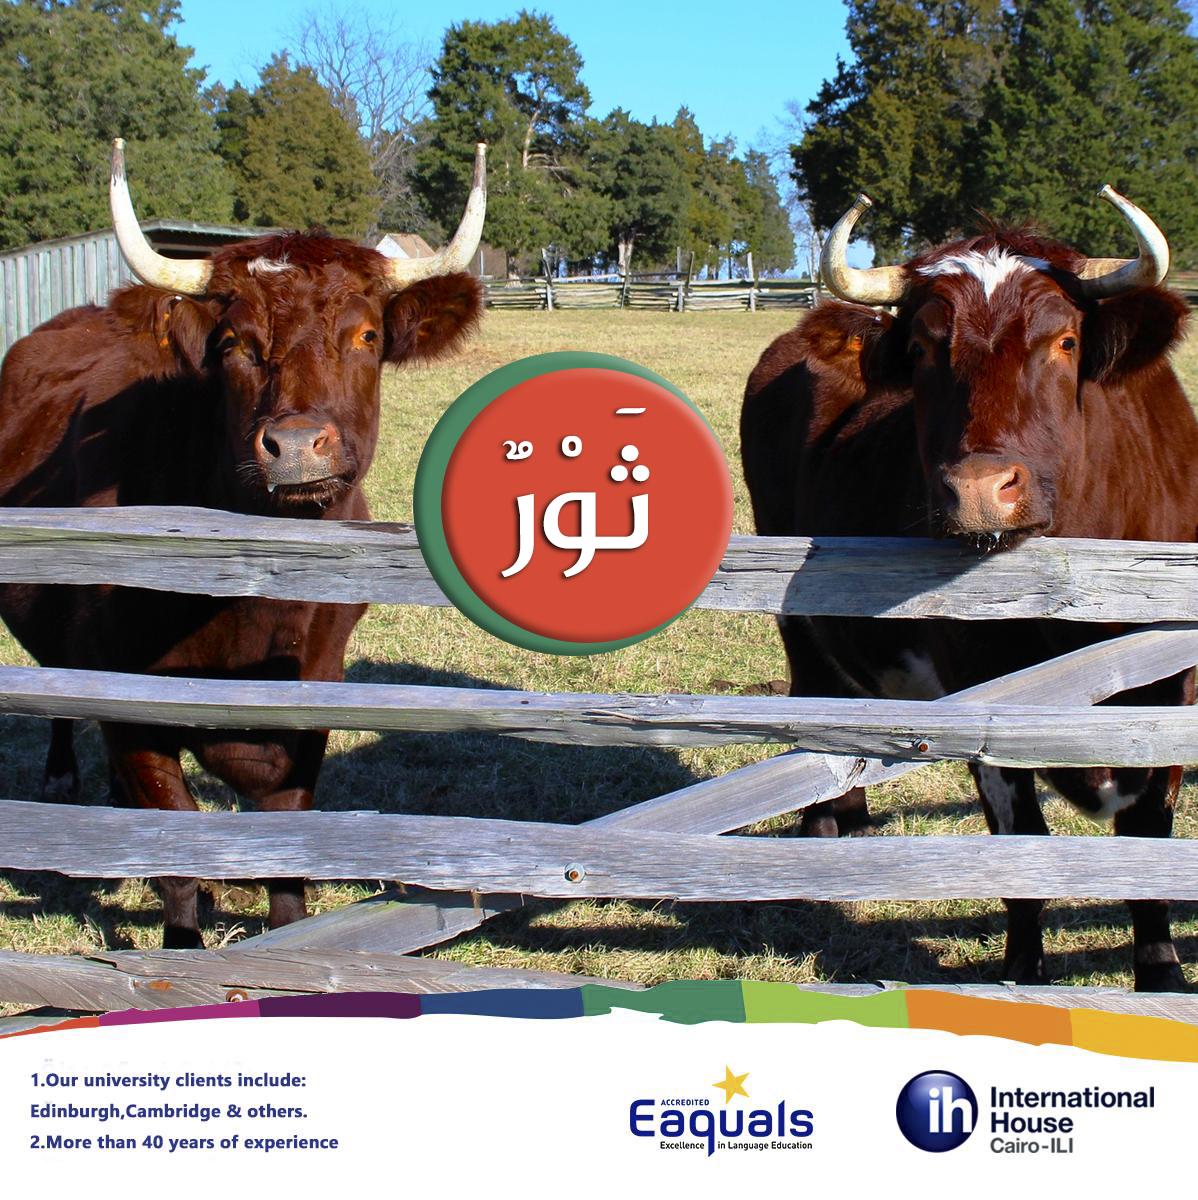 Oxen ثور Thawrun Farm Animals Names In Arabic أسماء حيوانات المزرعة باللغة العربية Arabic Studyabroad Msa Egypt C Cairo Modern Standard Arabic Animals